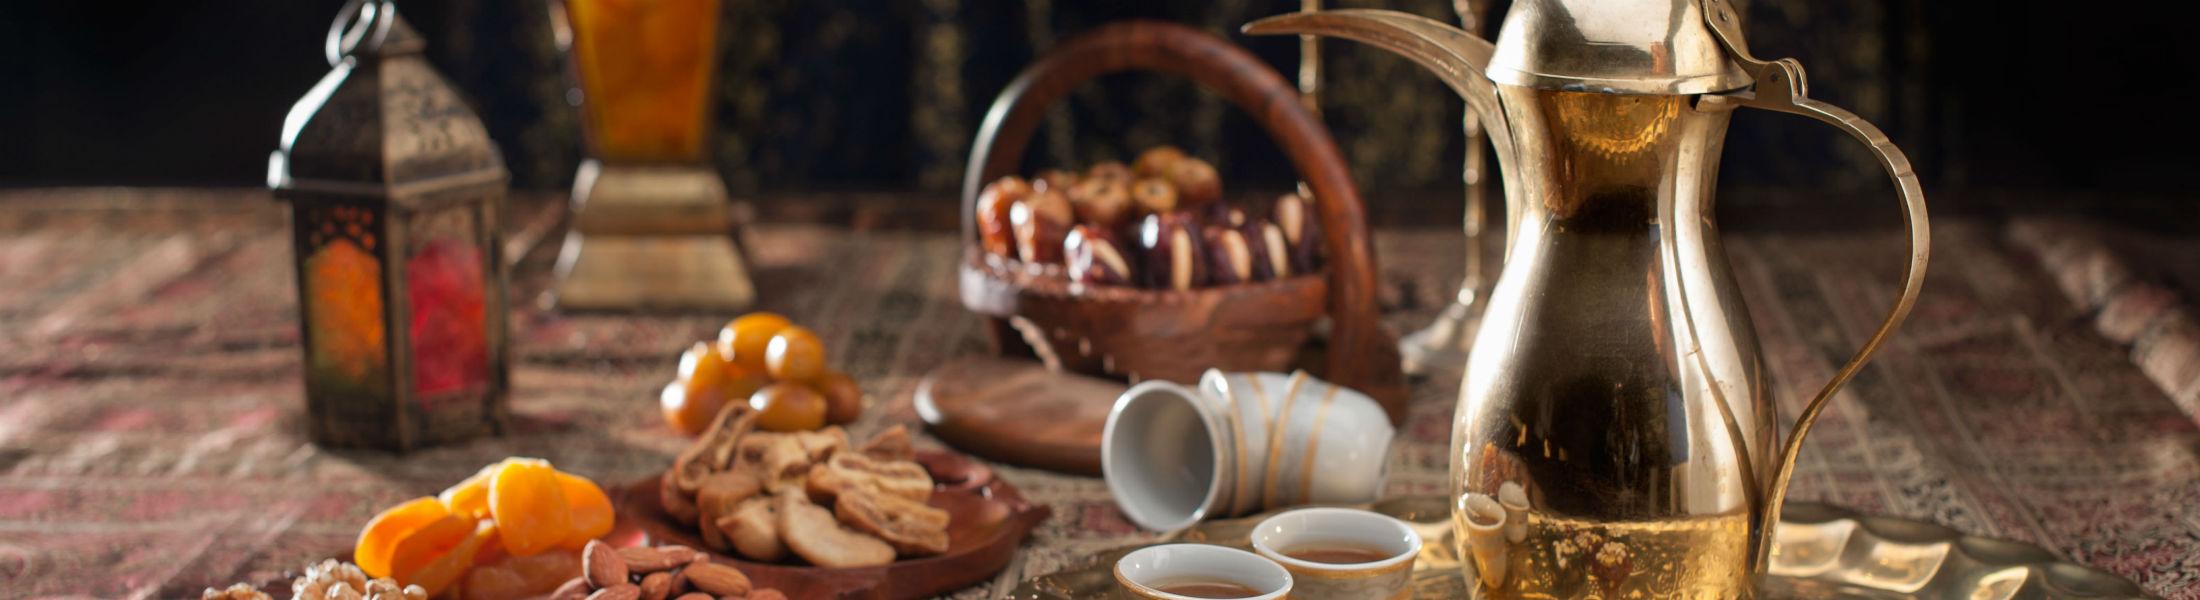 Dubai - Arabian tea